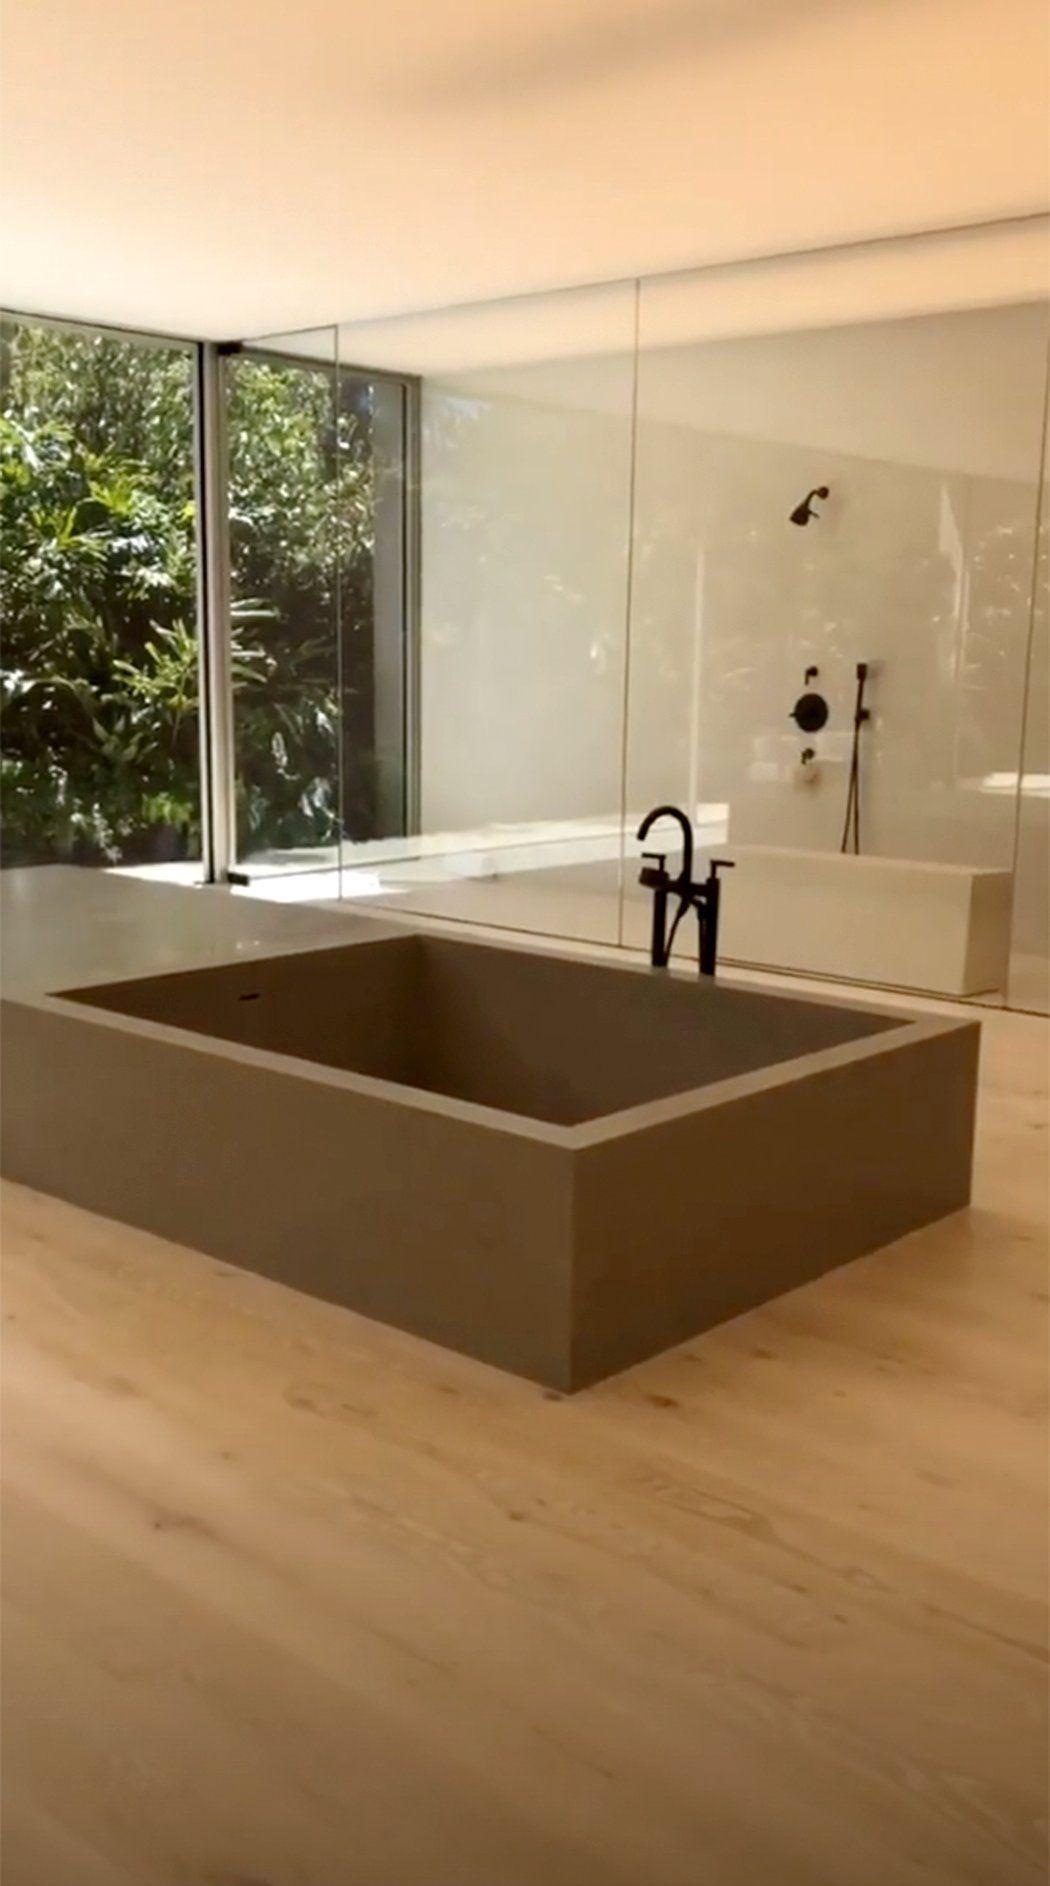 13 Creative Bathroom Sink Ideas You Should Try Idee Salle De Bain Salle De Bain Design Petite Salle De Bain Avec Douche